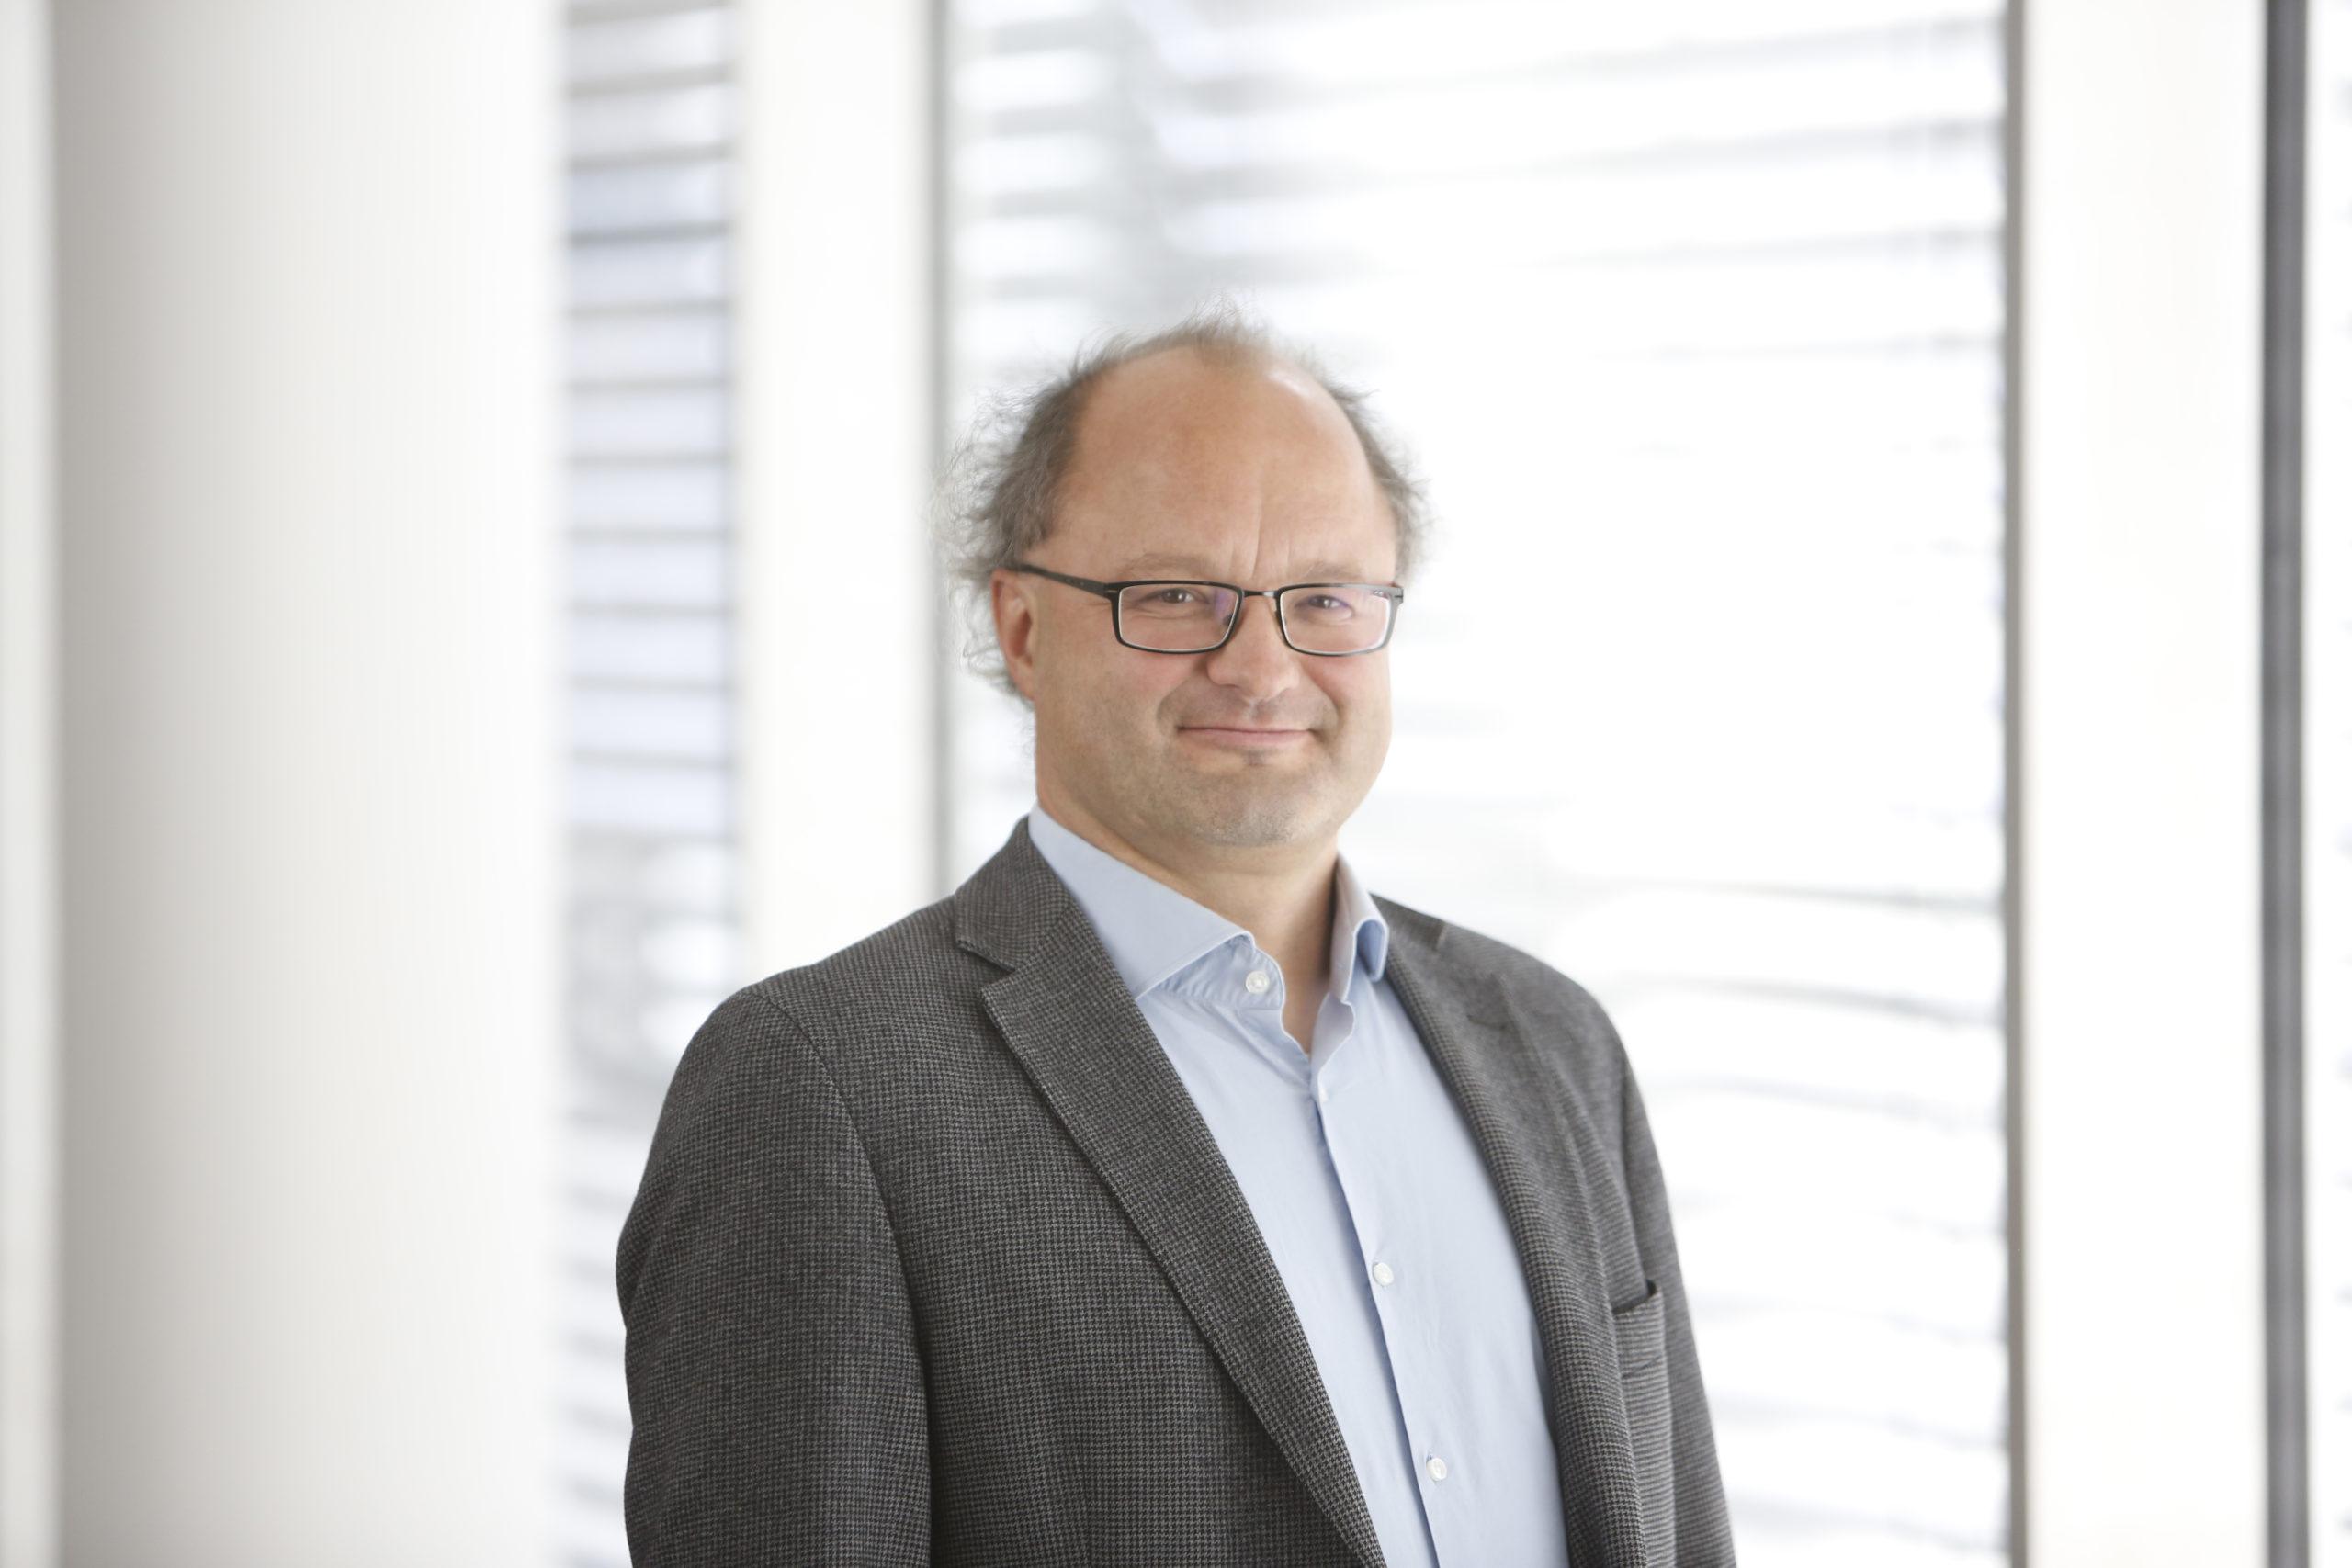 Prof. Dr. Peter Wasserscheid